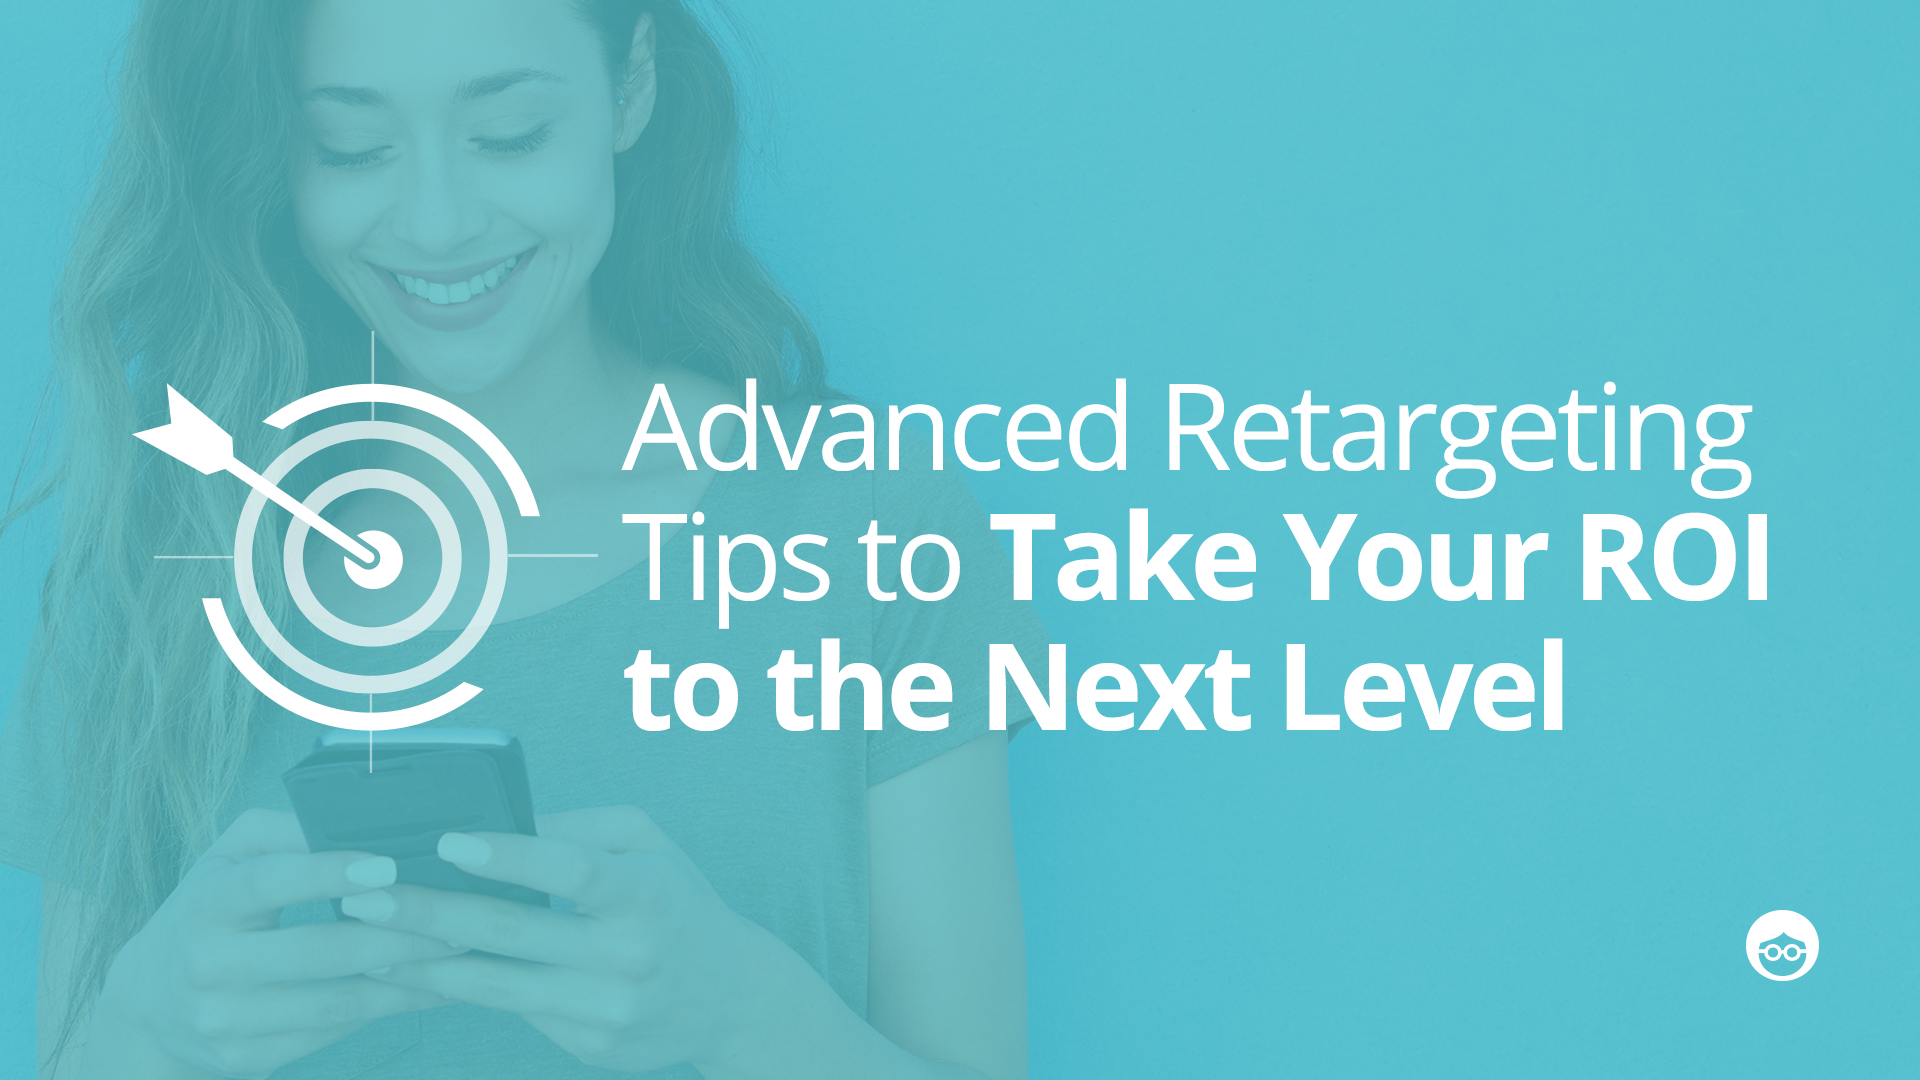 Advanced Retargeting Tips